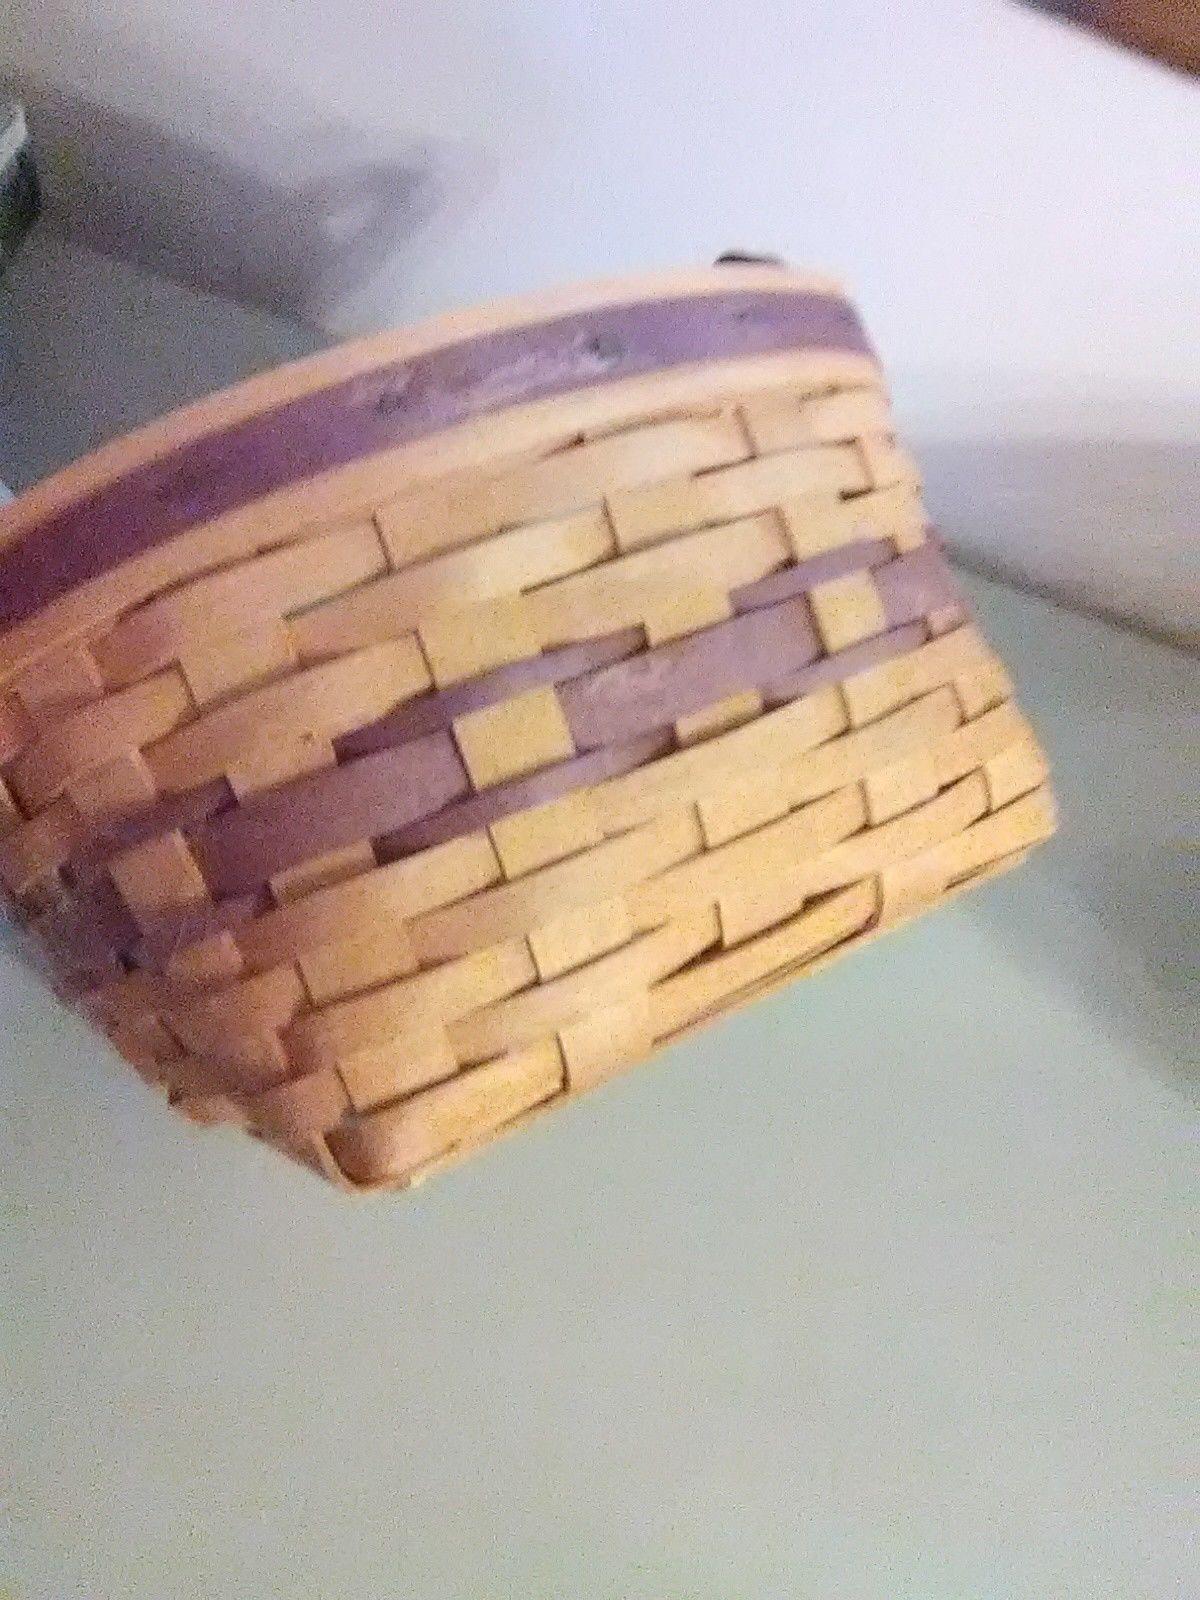 Longaberger May Basket - 1997 - Leather Strap Handles image 3